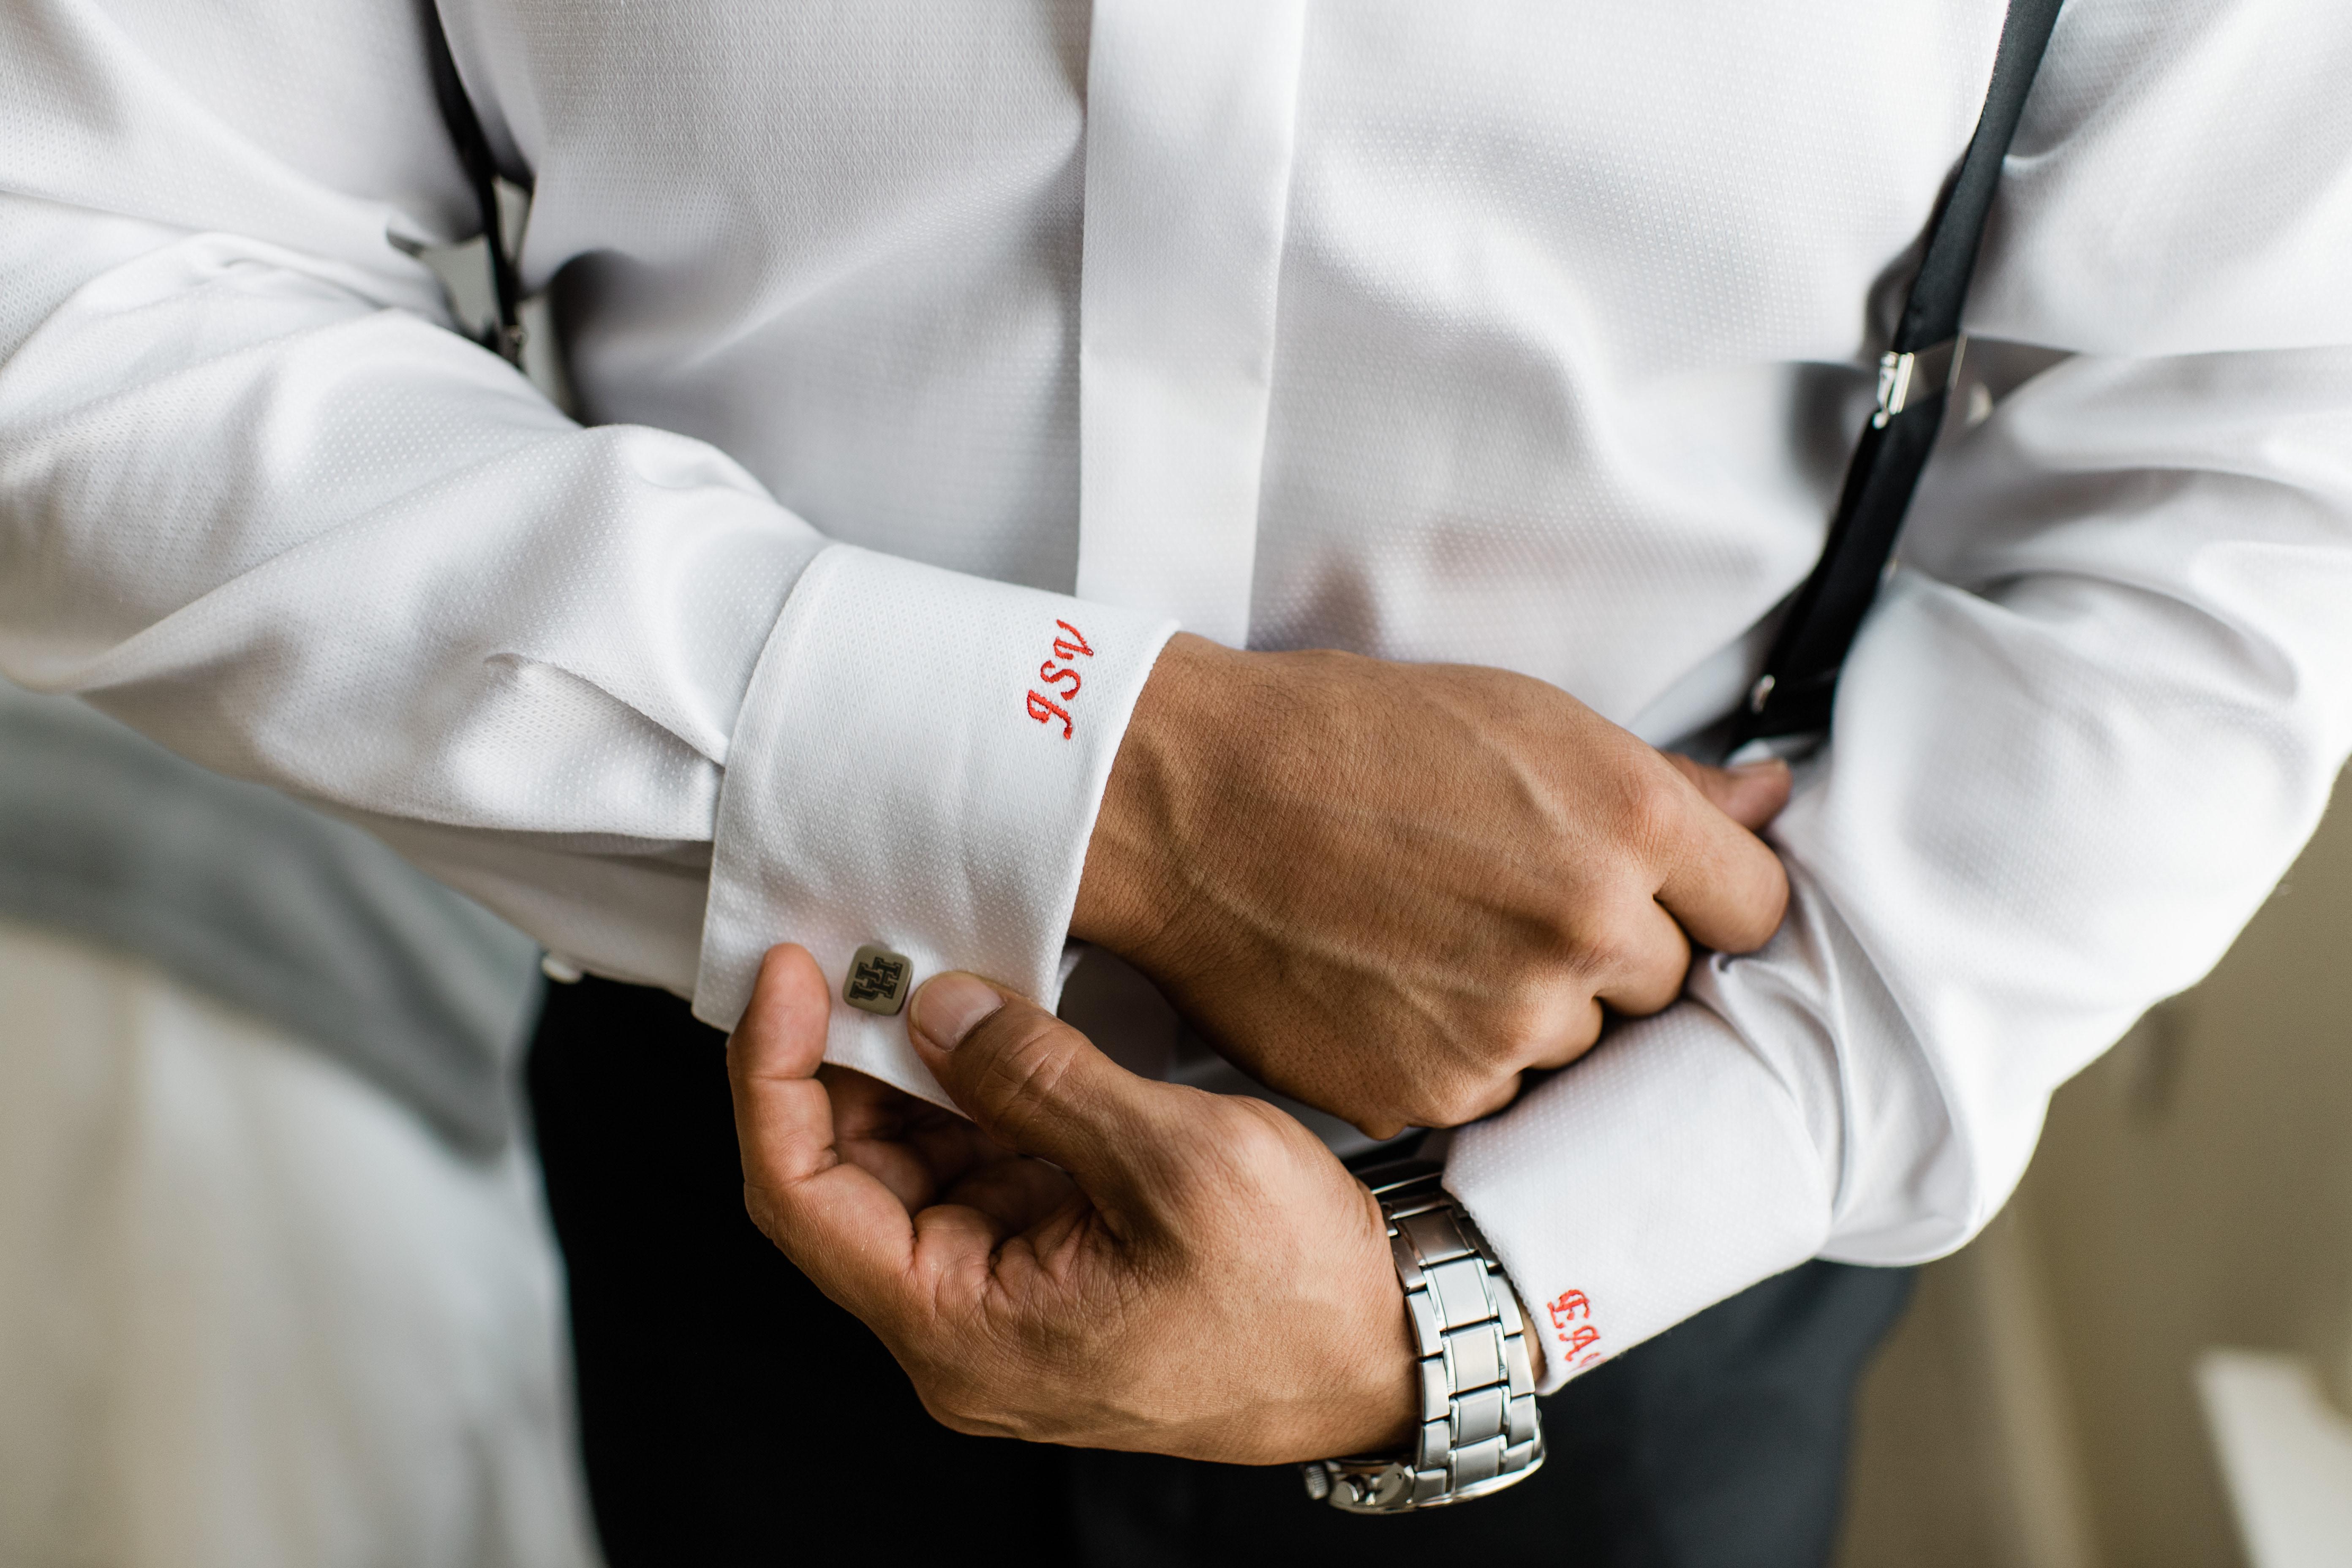 The groom has University of Houston cuff links.